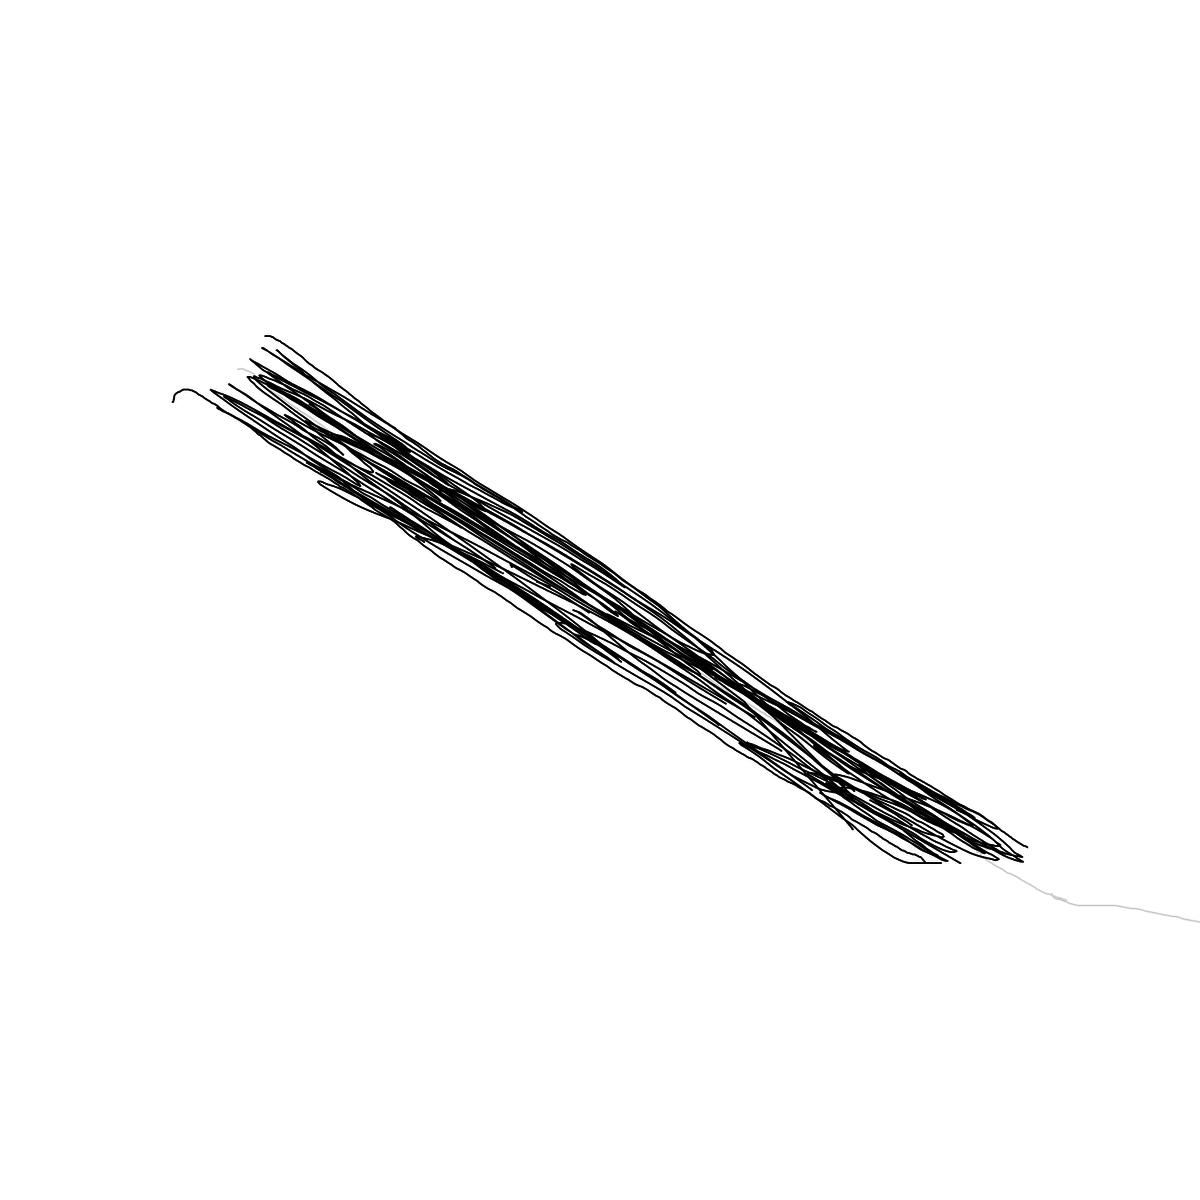 BAAAM drawing#23138 lat:35.7411422729492200lng: 51.3824272155761700